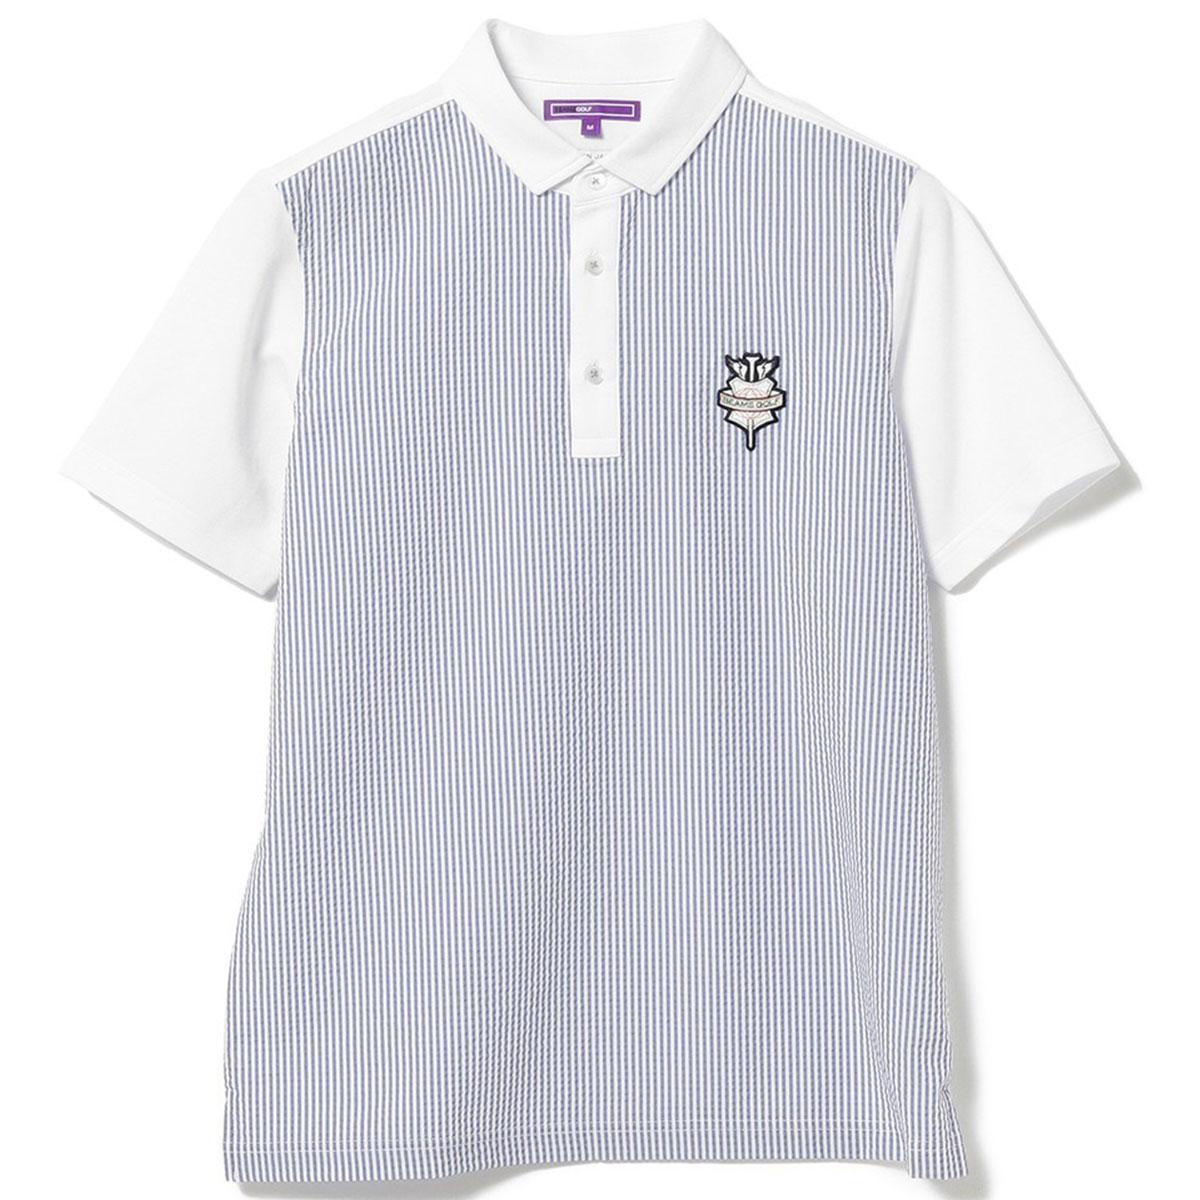 BEAMS GOLF PURPLE LABEL サッカーストライプ クレリック ポロシャツ